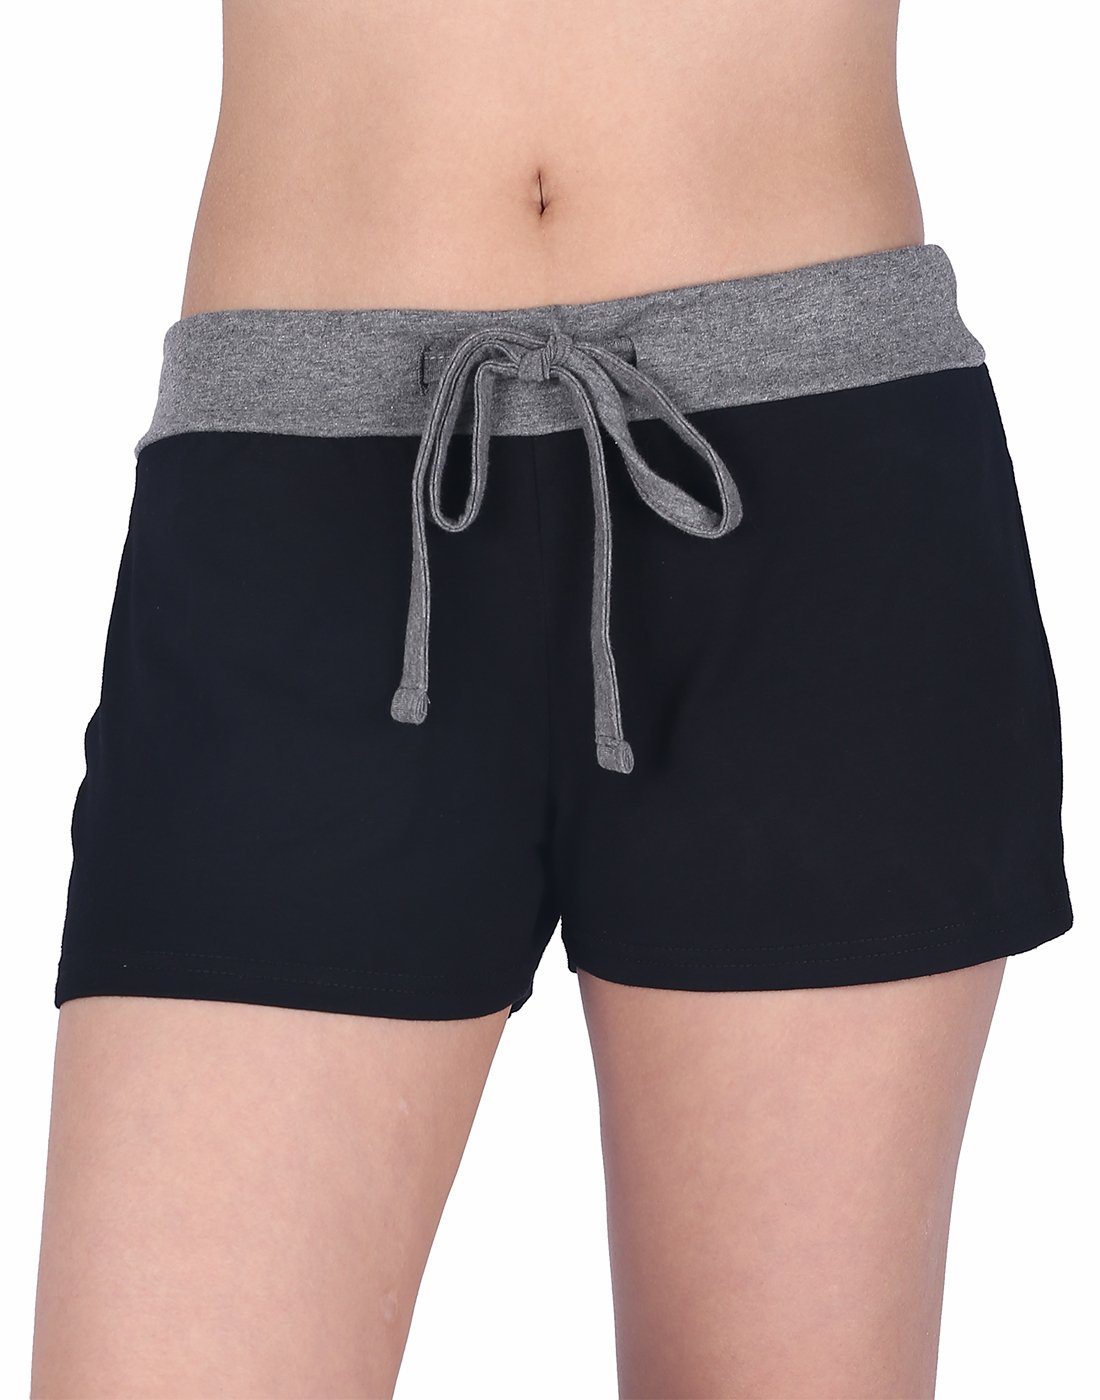 HDE Womens Juniors Pajama Shorts Sleep Wide Waistband Design Print Yoga Bottoms (Black w/Gray, Medium)